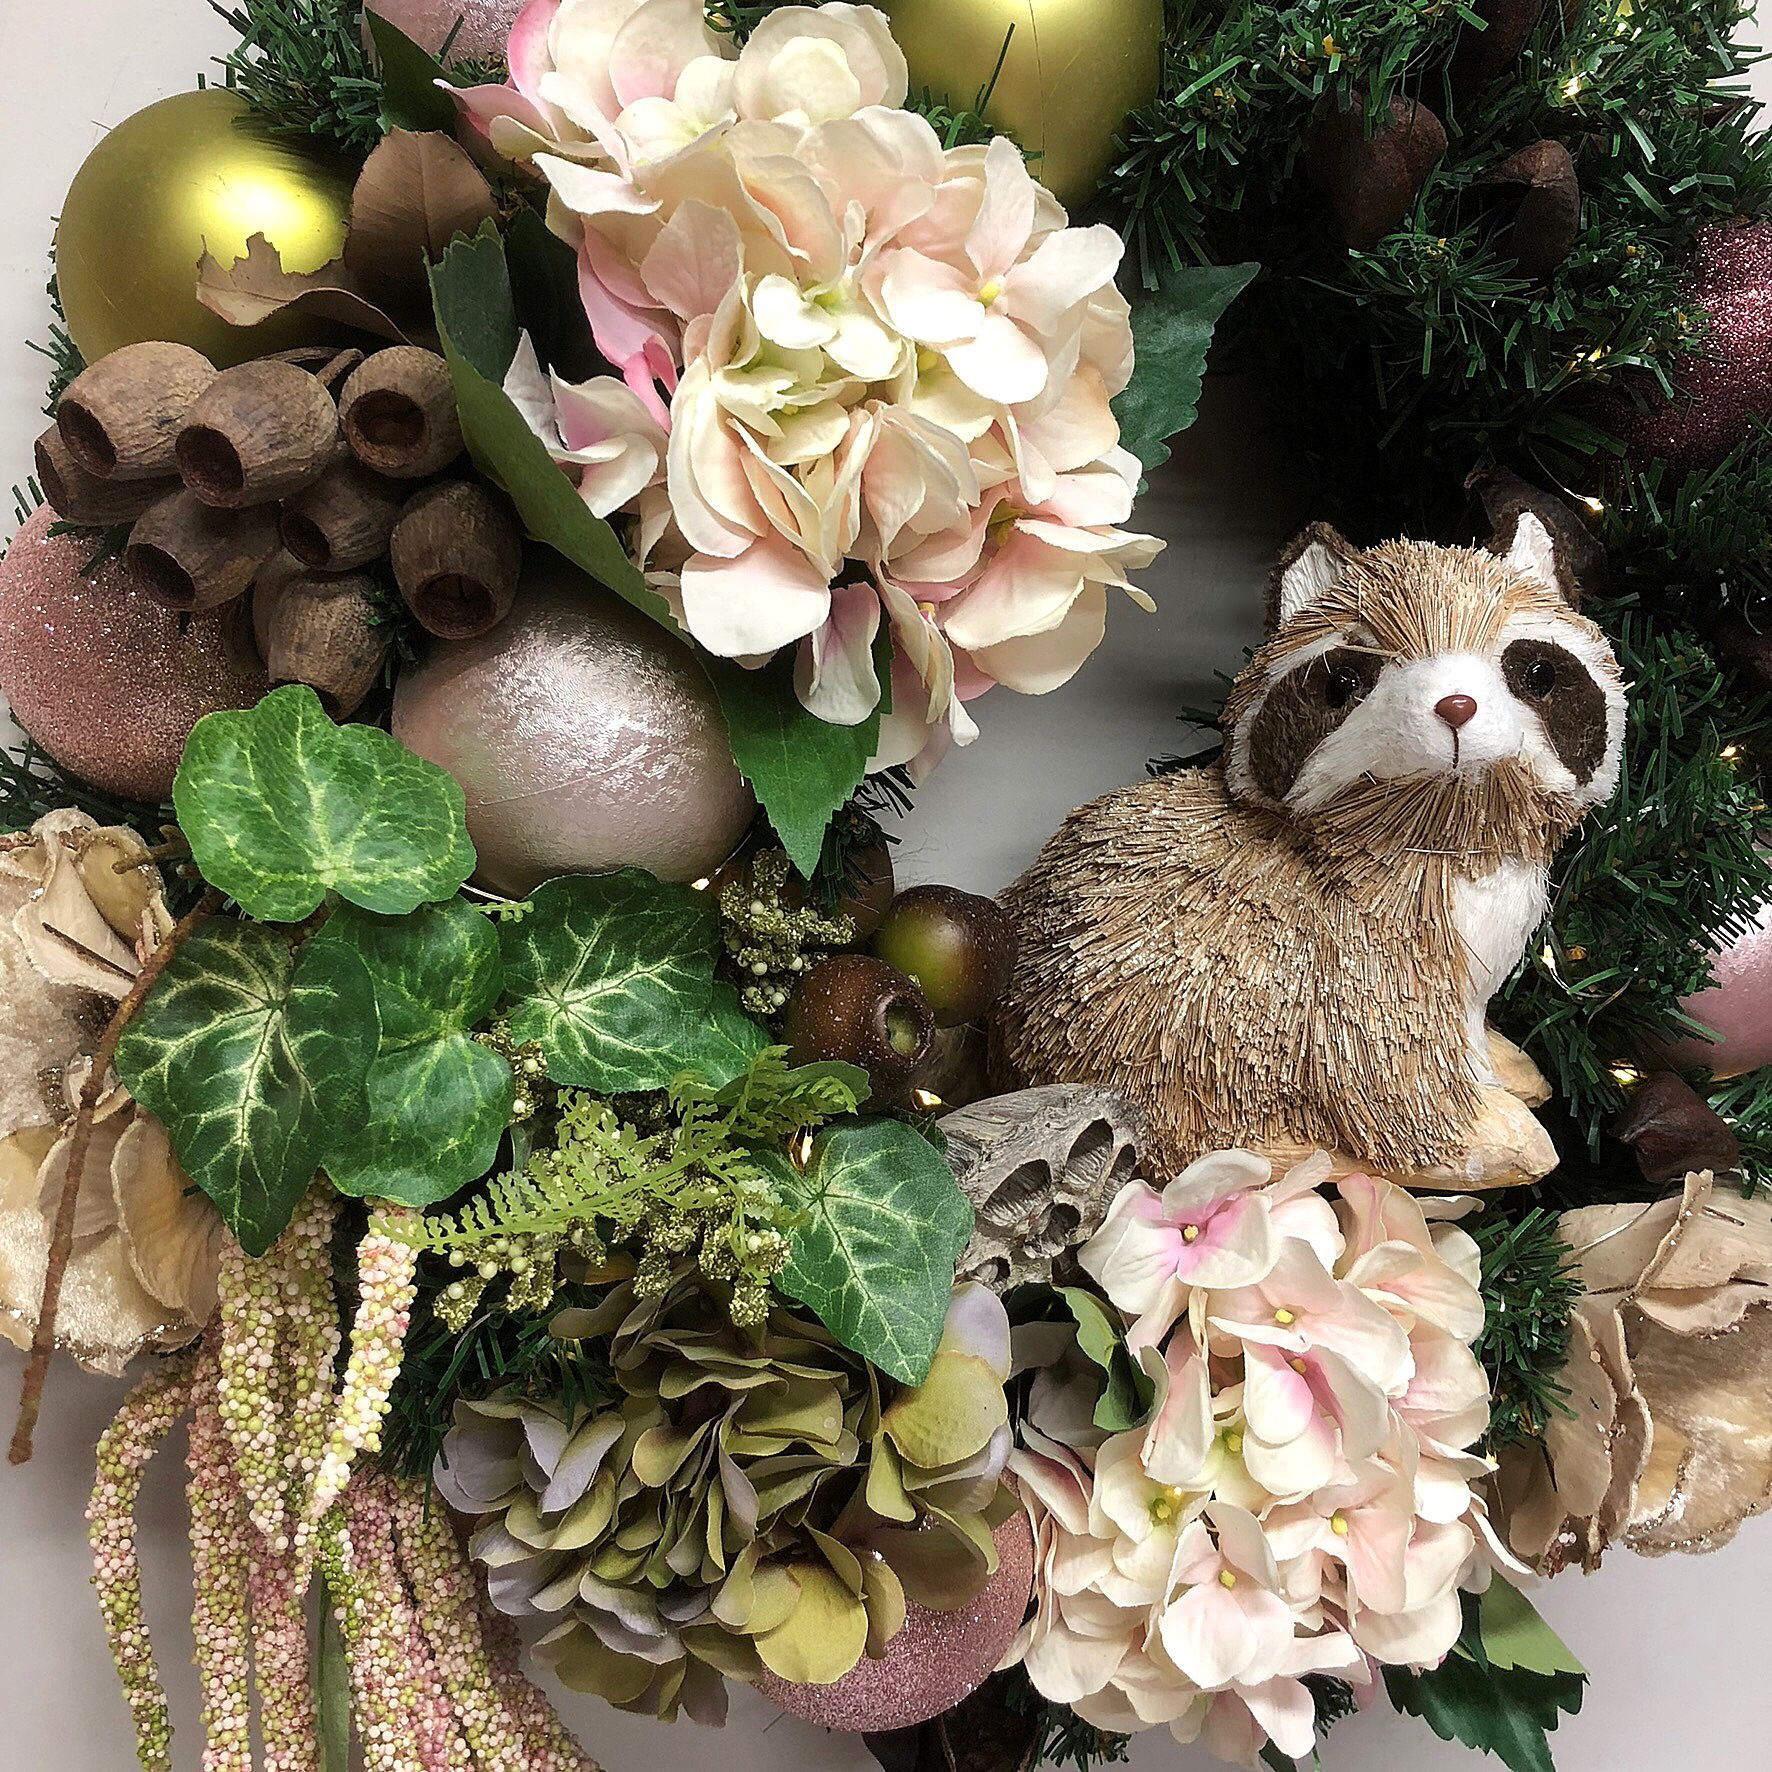 Garden wreath with friendly raccoon. Floral wreath